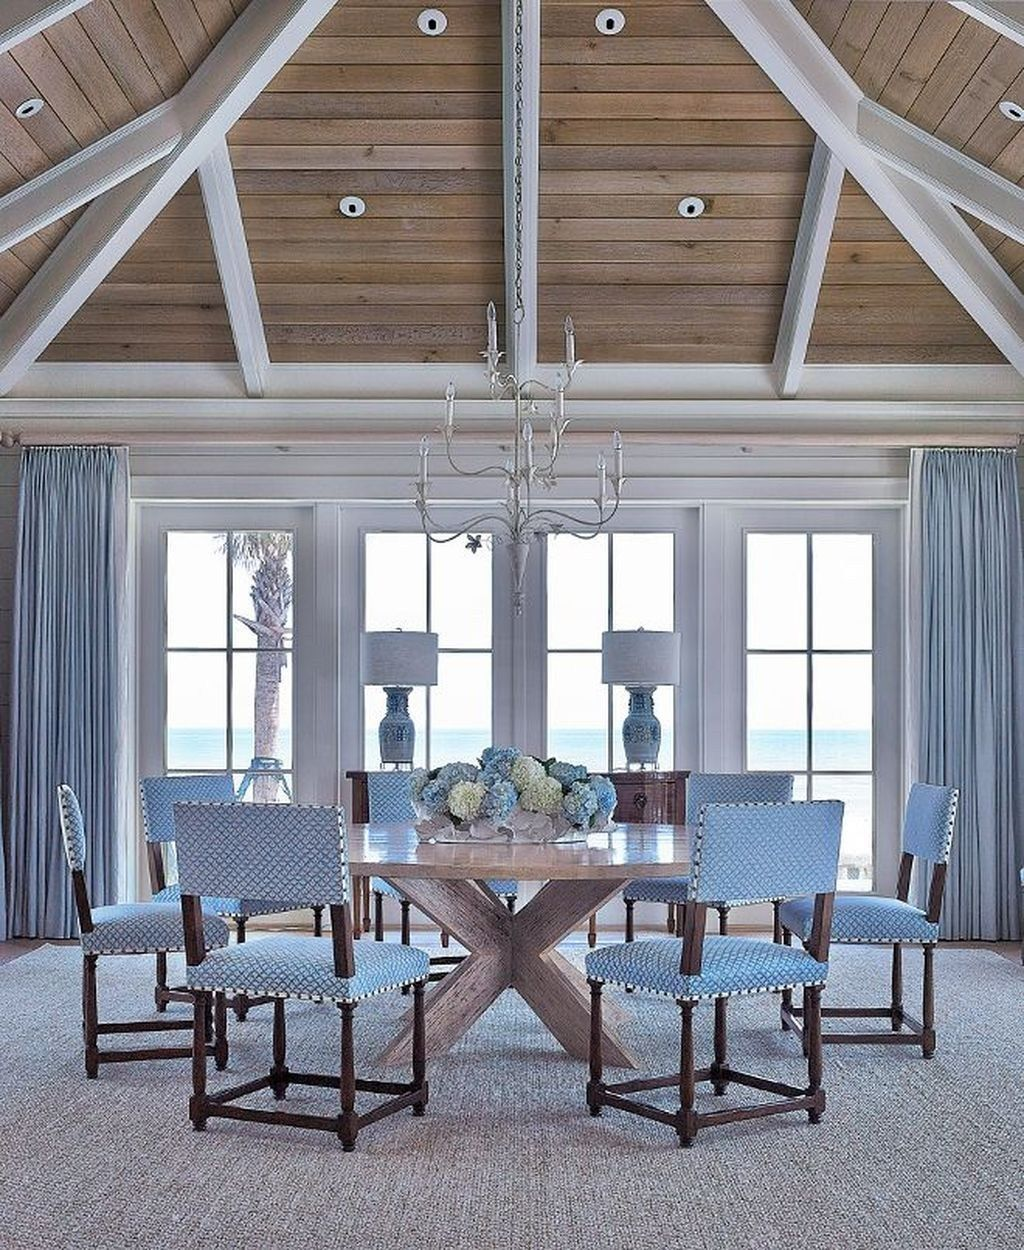 Beach Home Interior Design Ideas: 50 Amazing Nautical Dining Room Decor Ideas